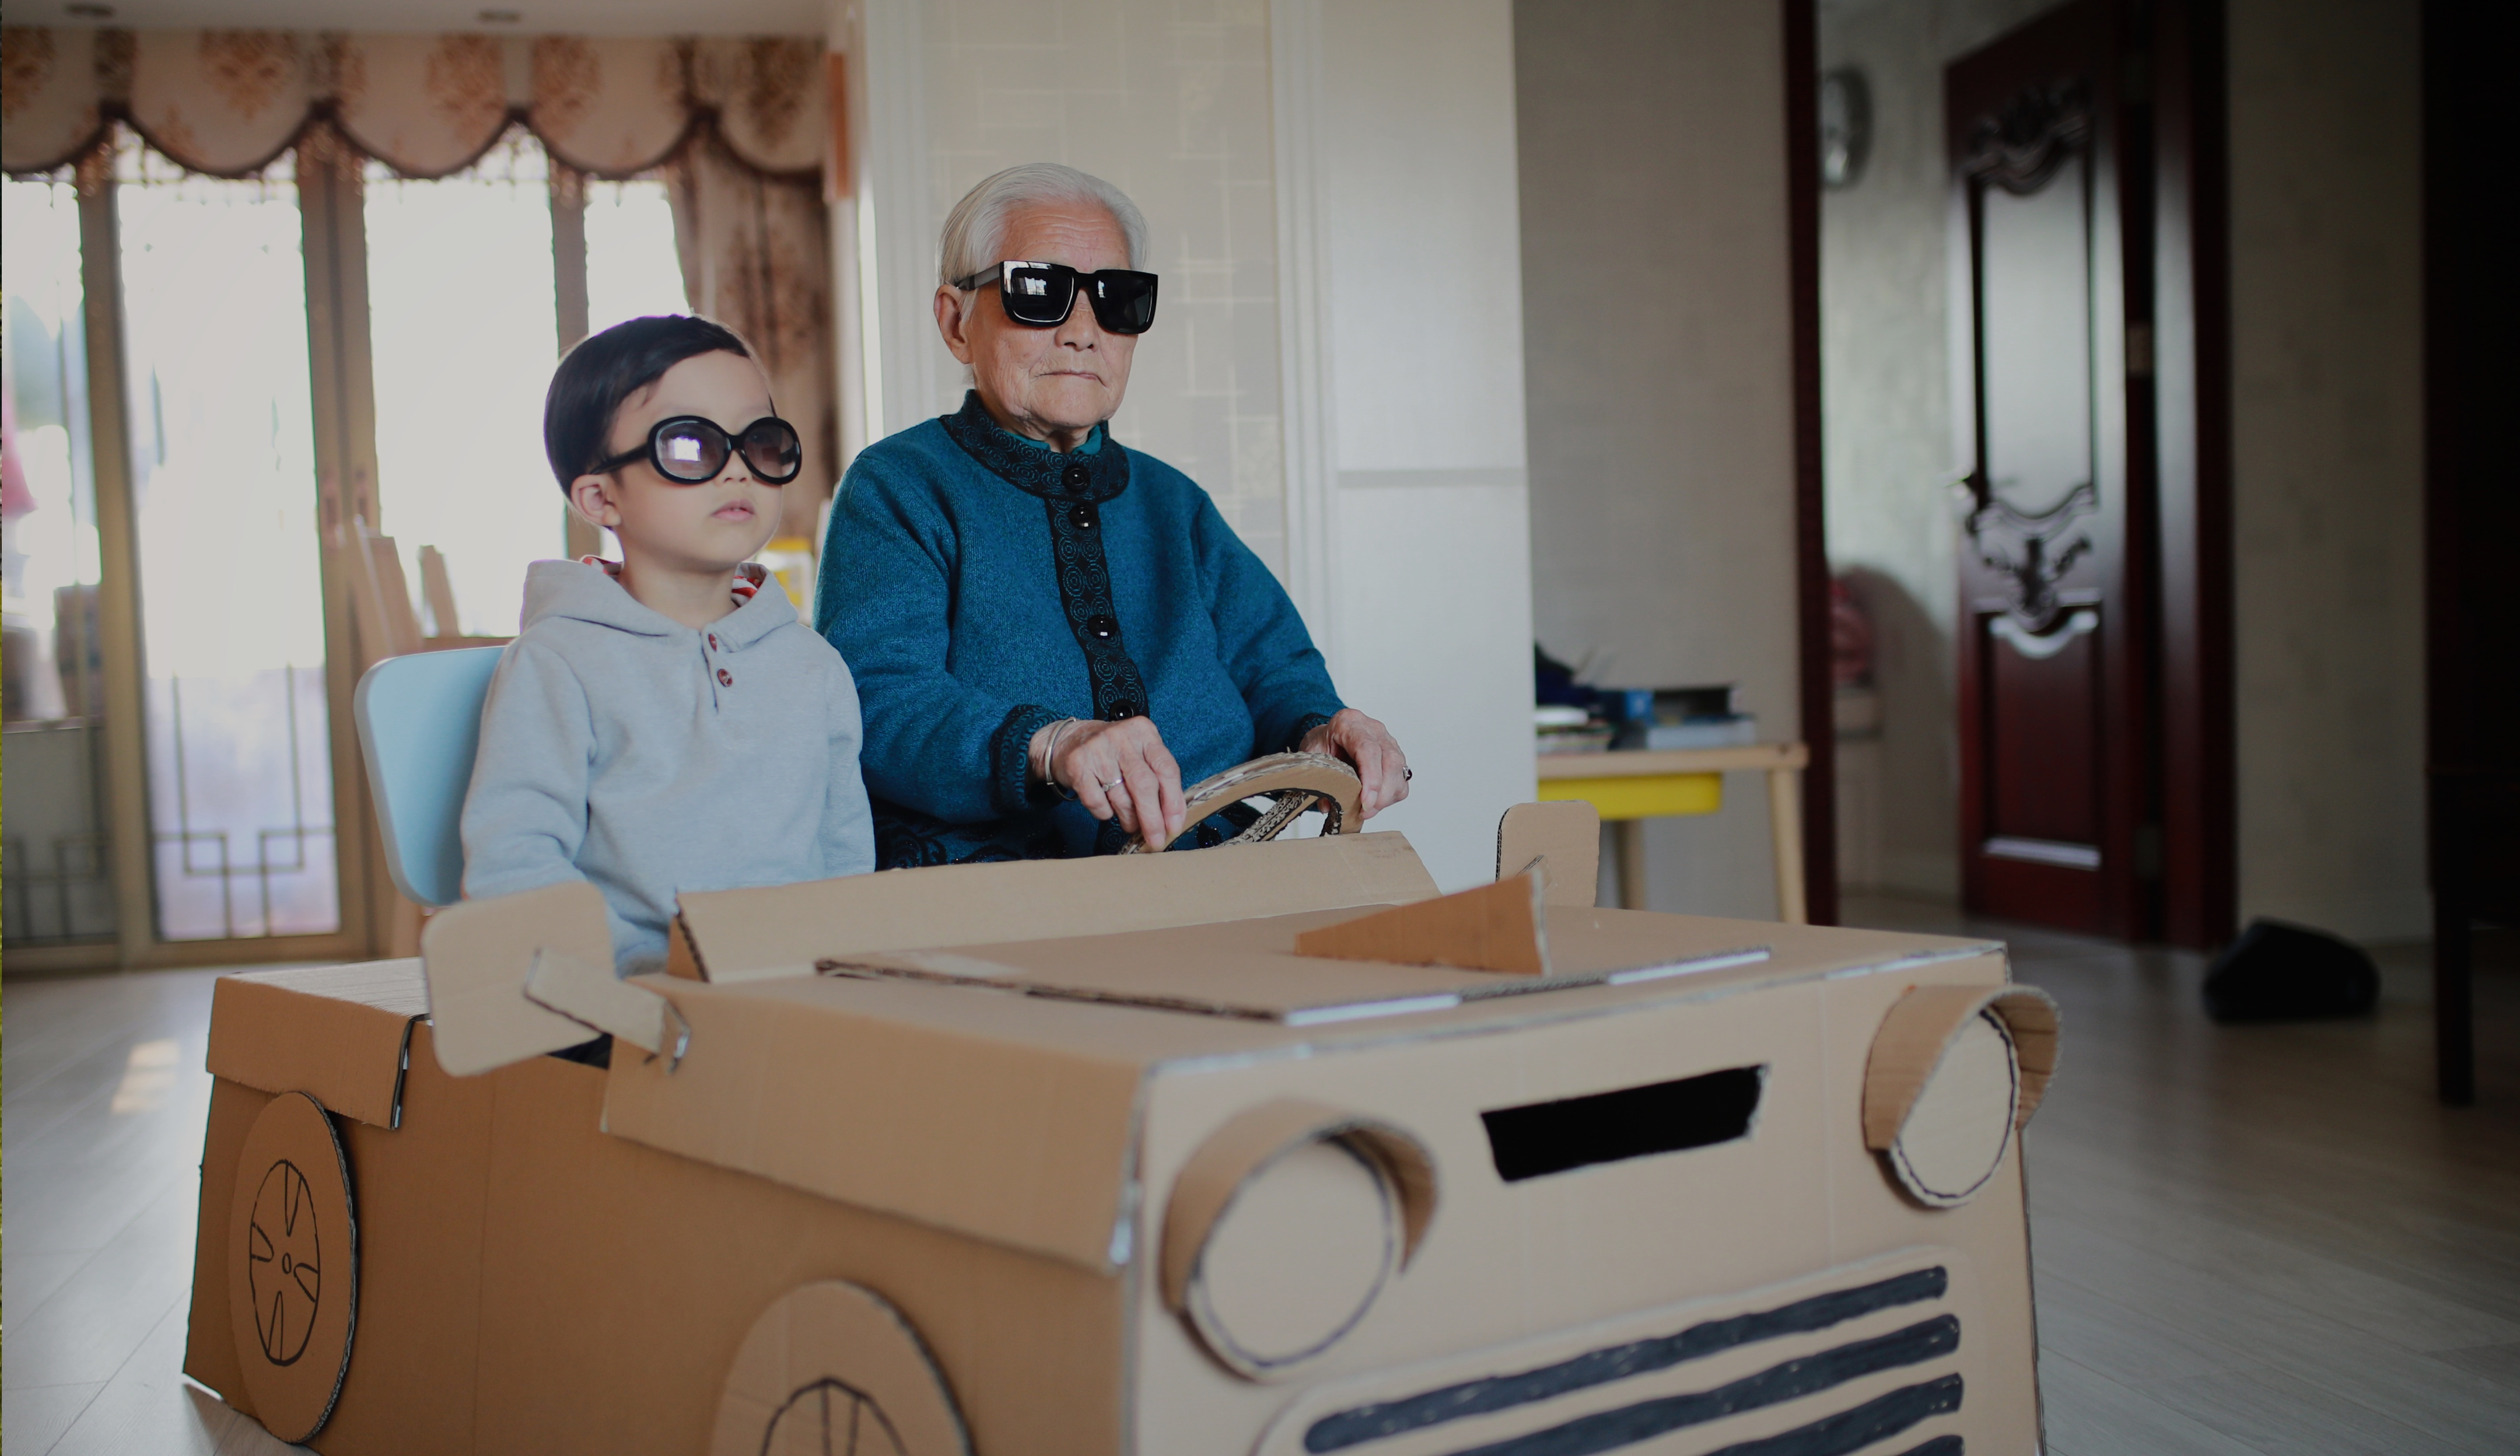 Saving-for-grandchildren-cardboard-car